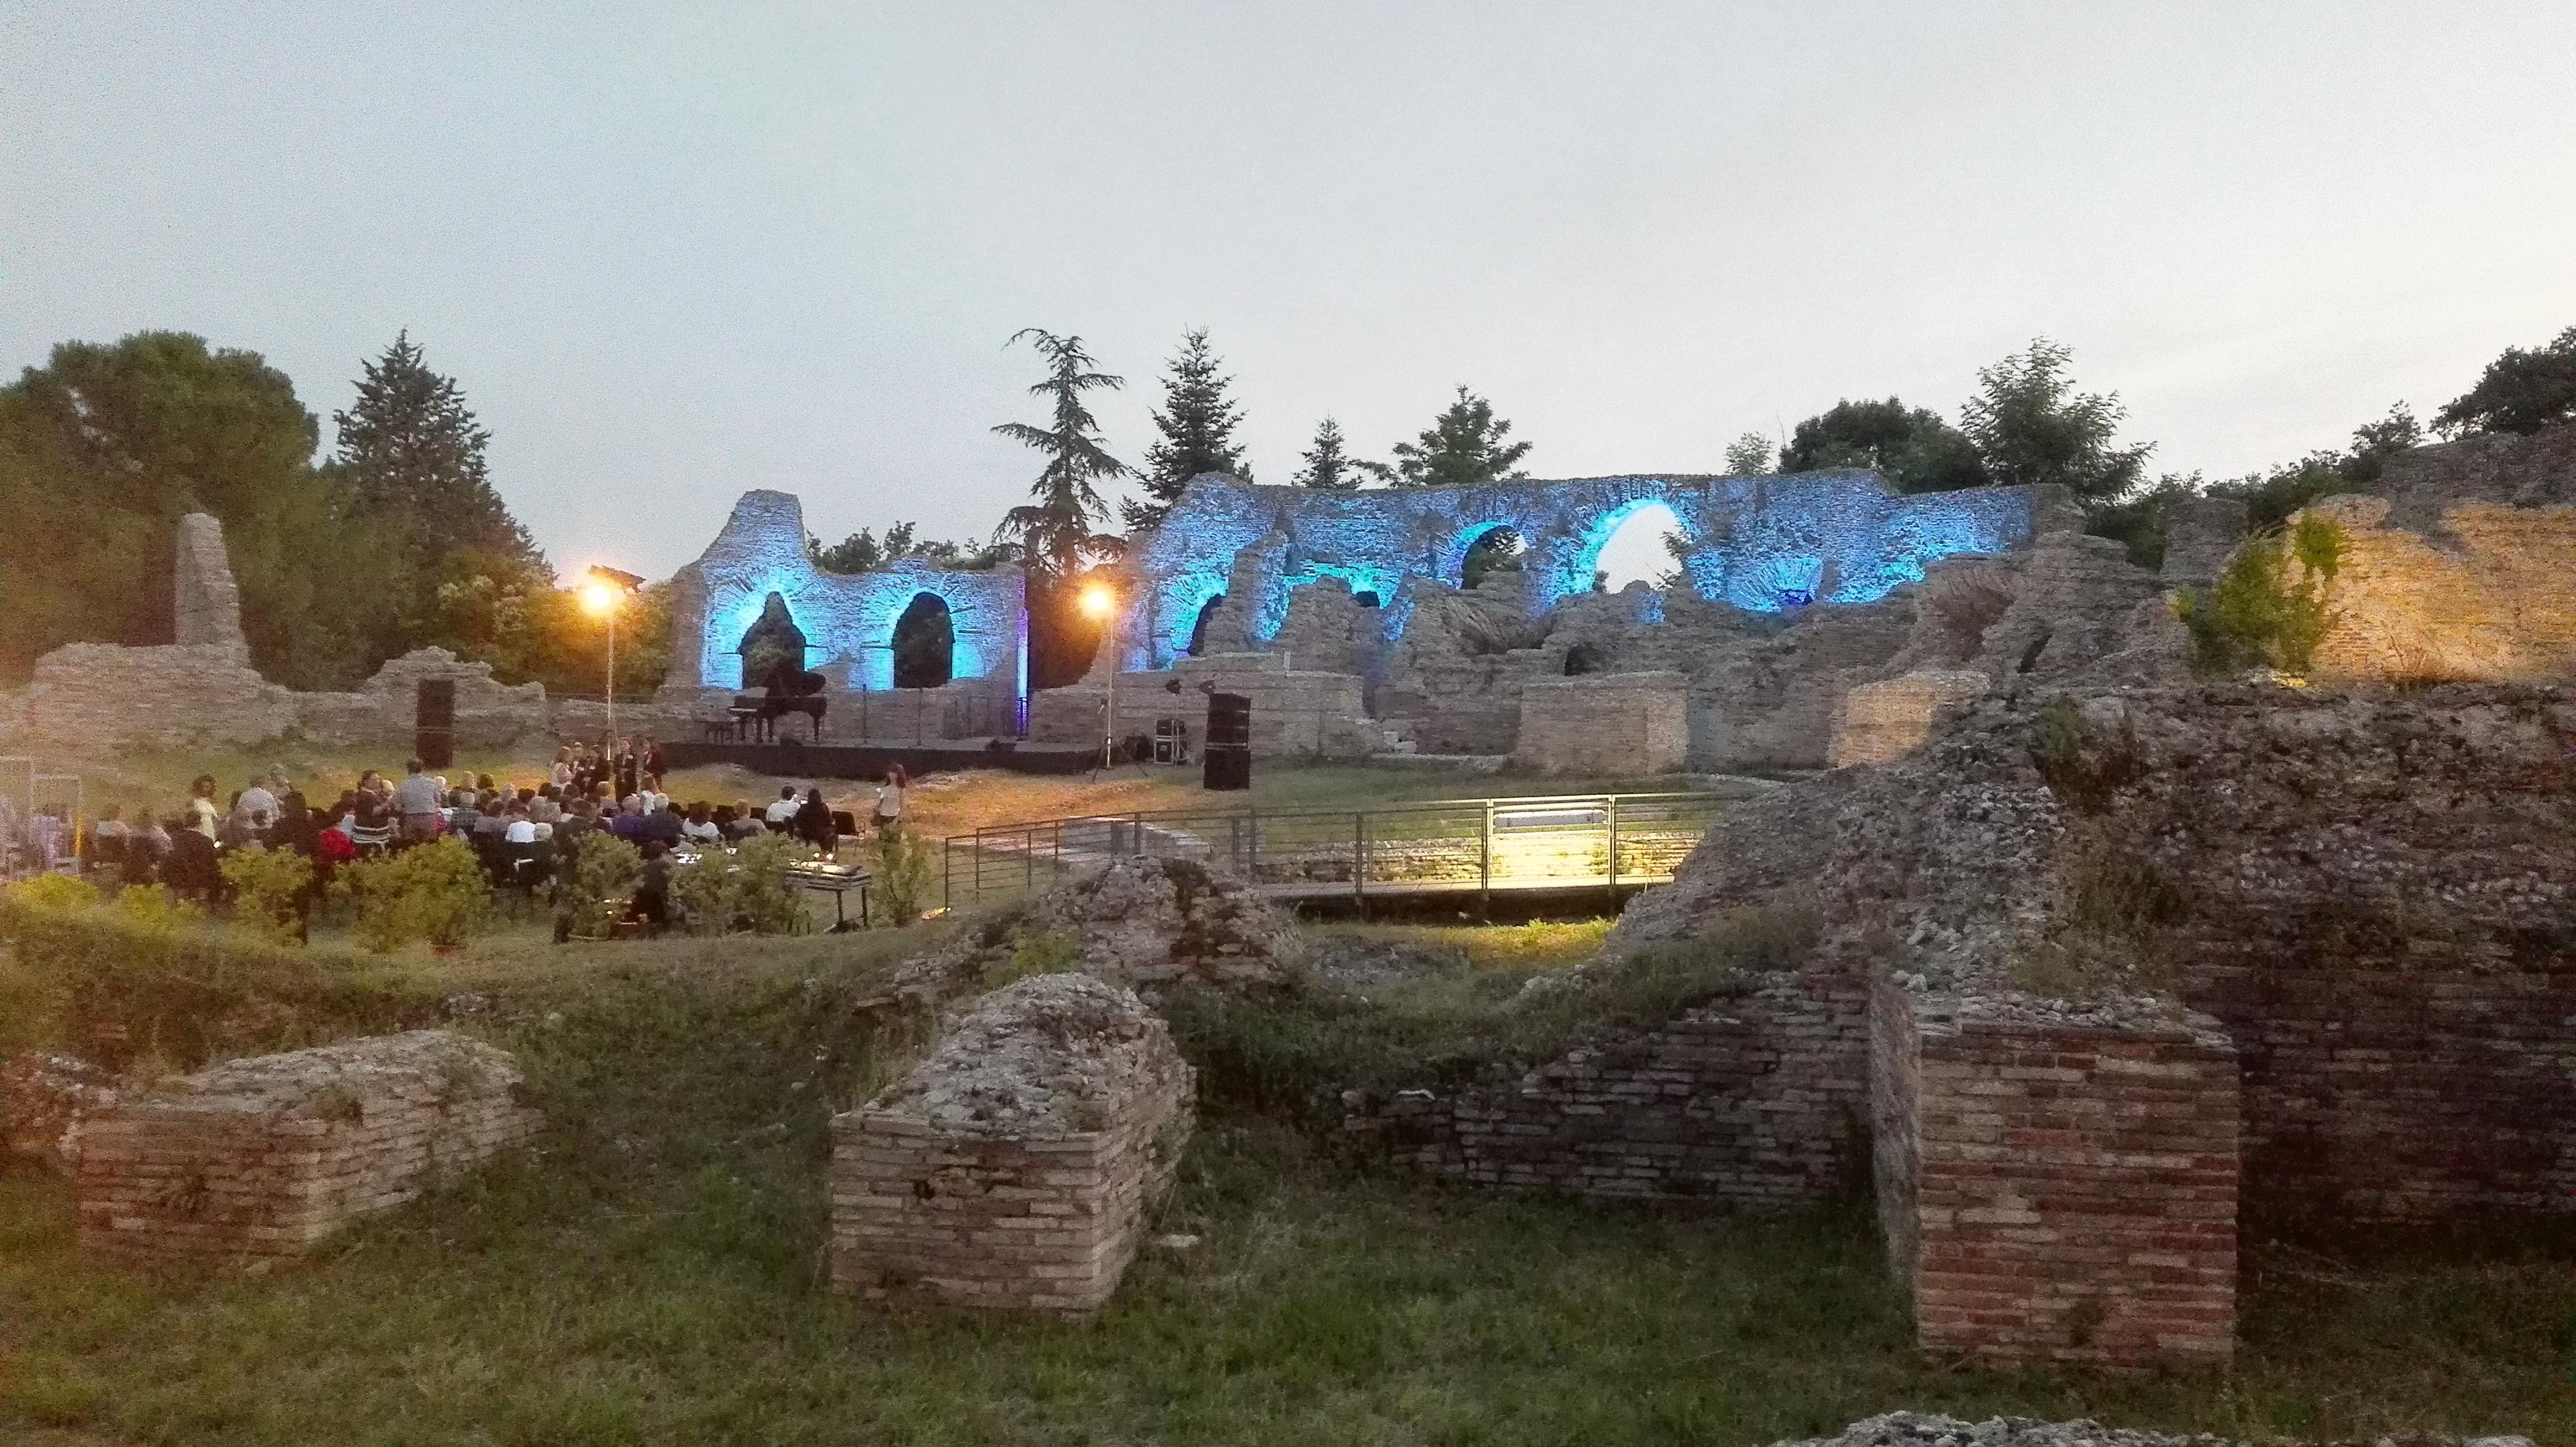 Teatro_romano__helvia_recina___1_